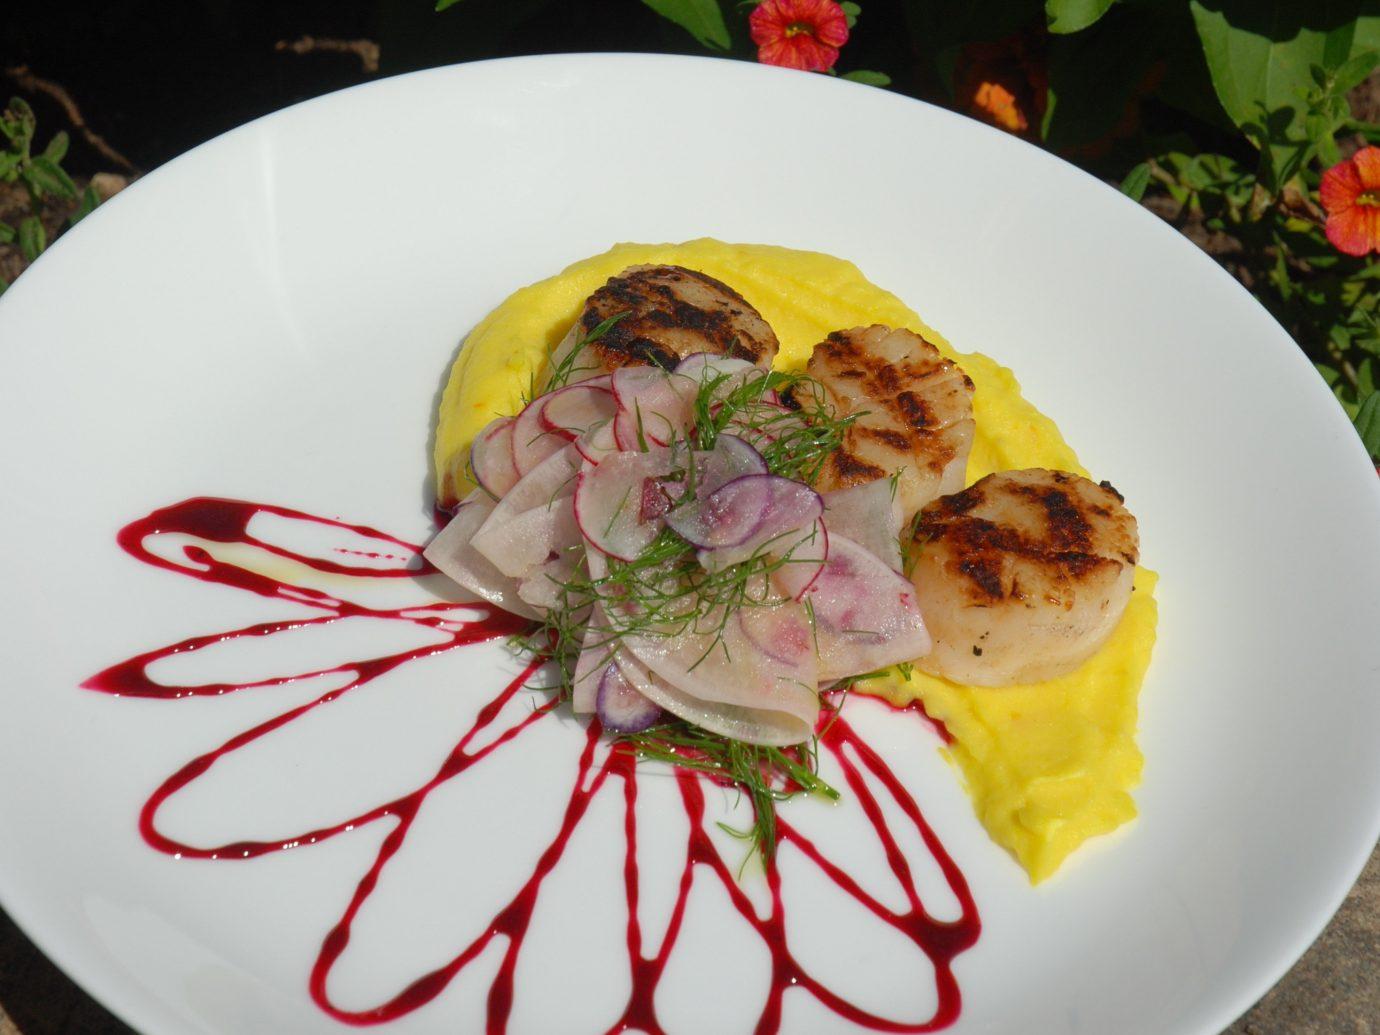 Boutique Hotels Hotels Outdoors + Adventure Trip Ideas Weekend Getaways plate food dish meal produce cuisine breakfast meat